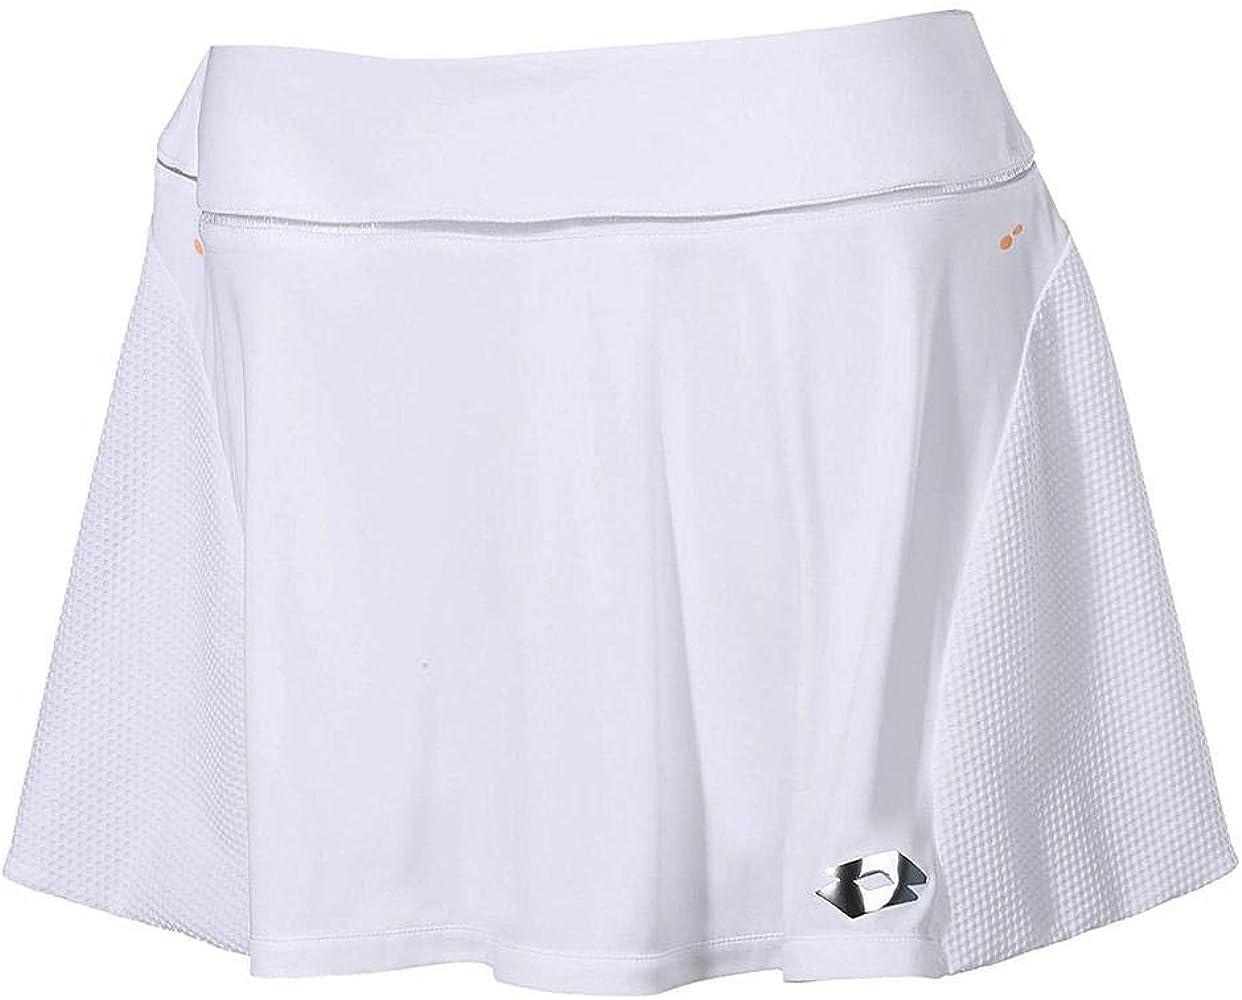 Lotto Nixia III W Falda de Tenis, Mujer, Blanco (Wht), S: Amazon ...